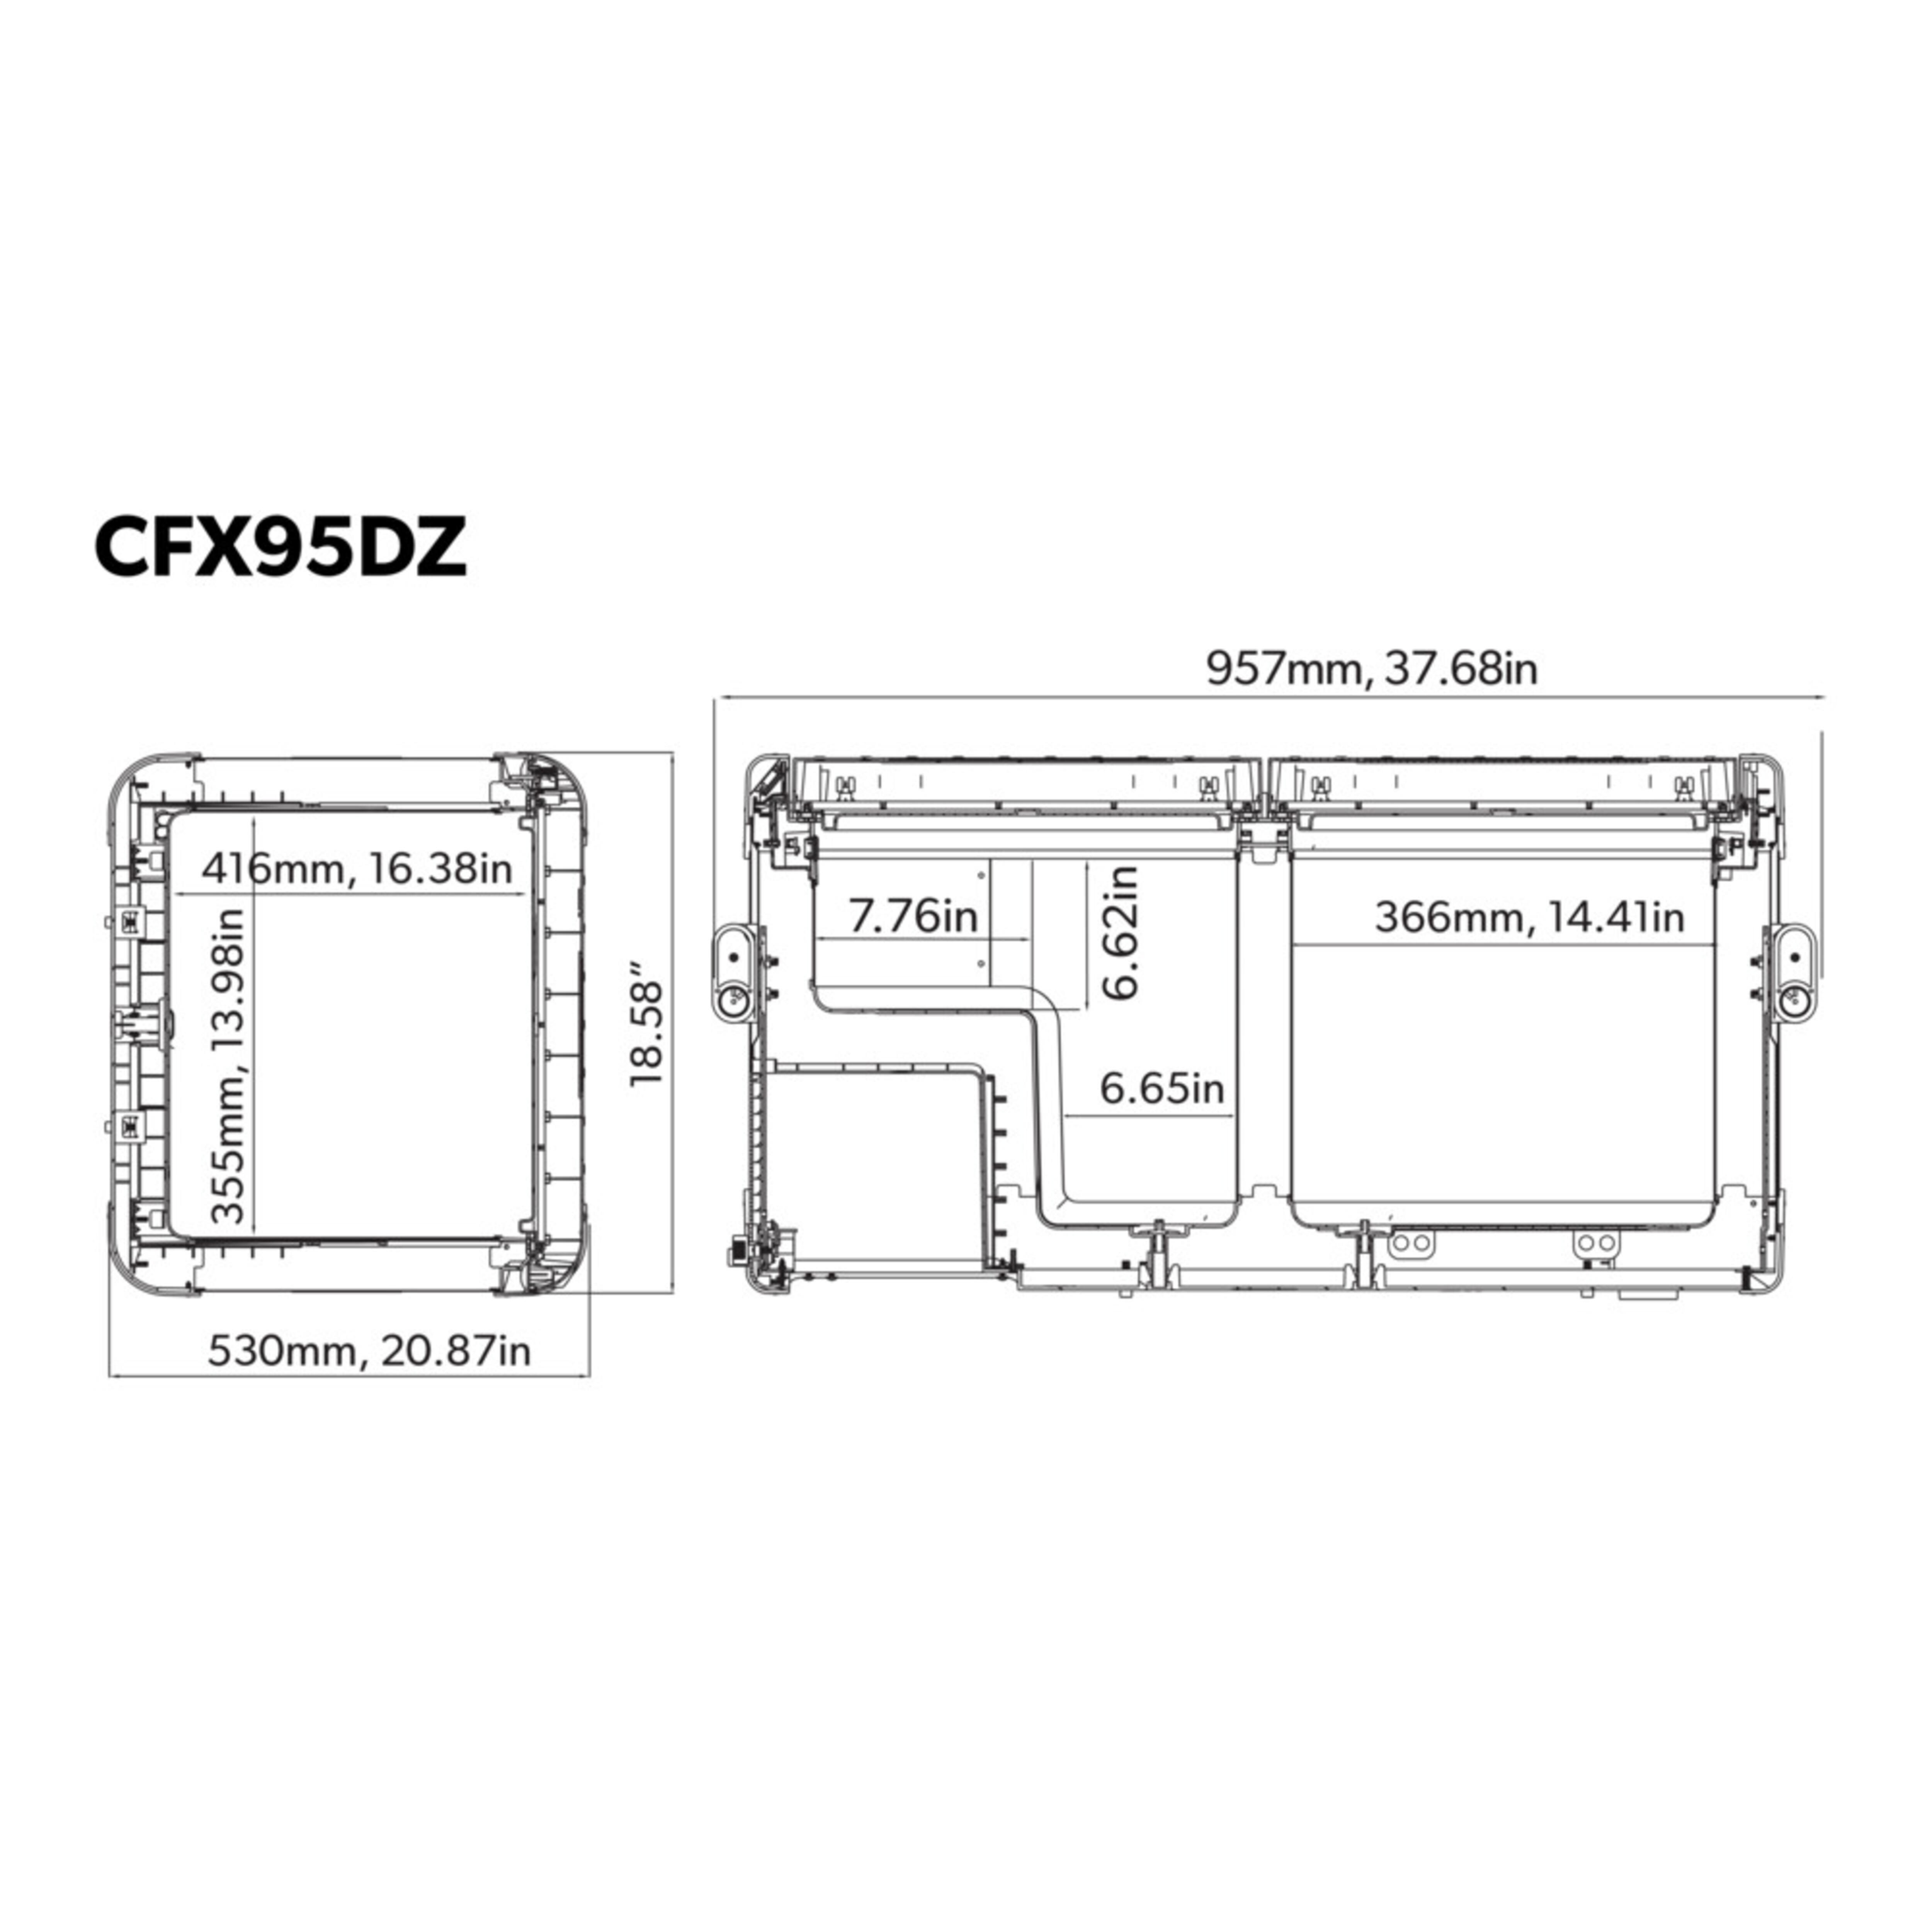 medium resolution of cfx 95dzw dimensions cfx 95dzw dimensions download manuals operating manual